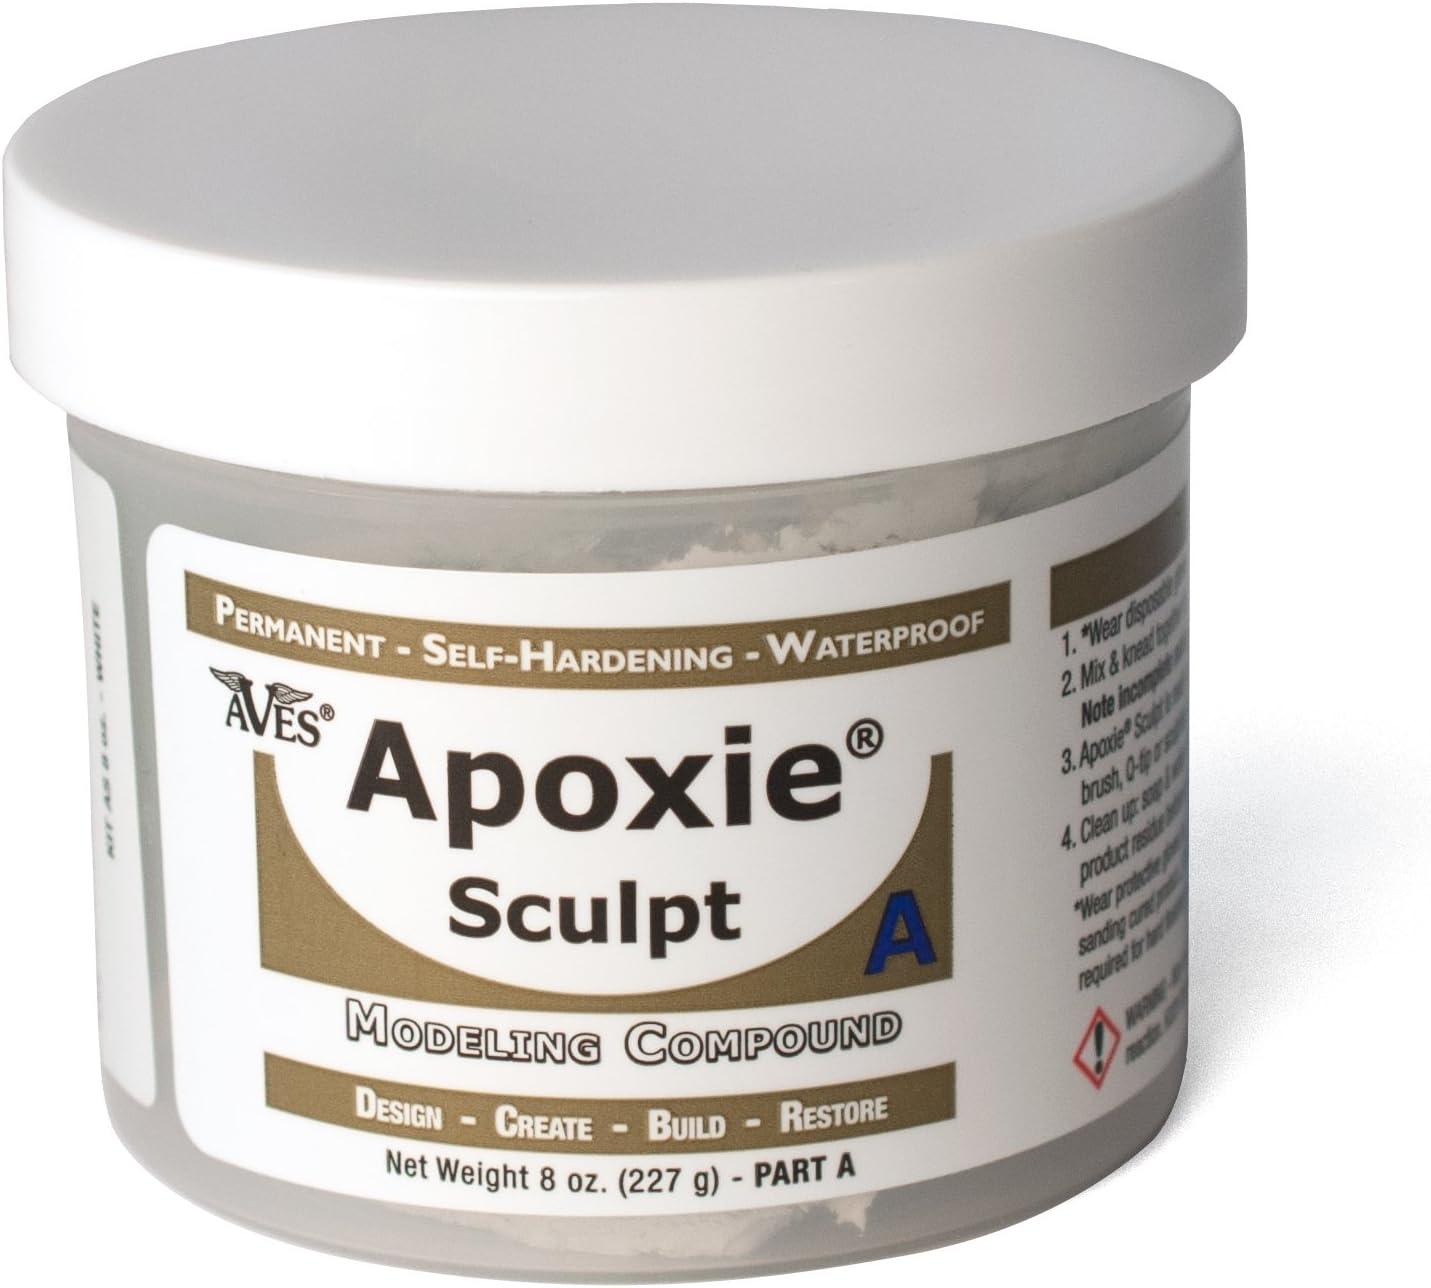 Aves Apoxie Sculpt 1Lb - Pasta epoxy de modelado, 453,6 g, color blanco